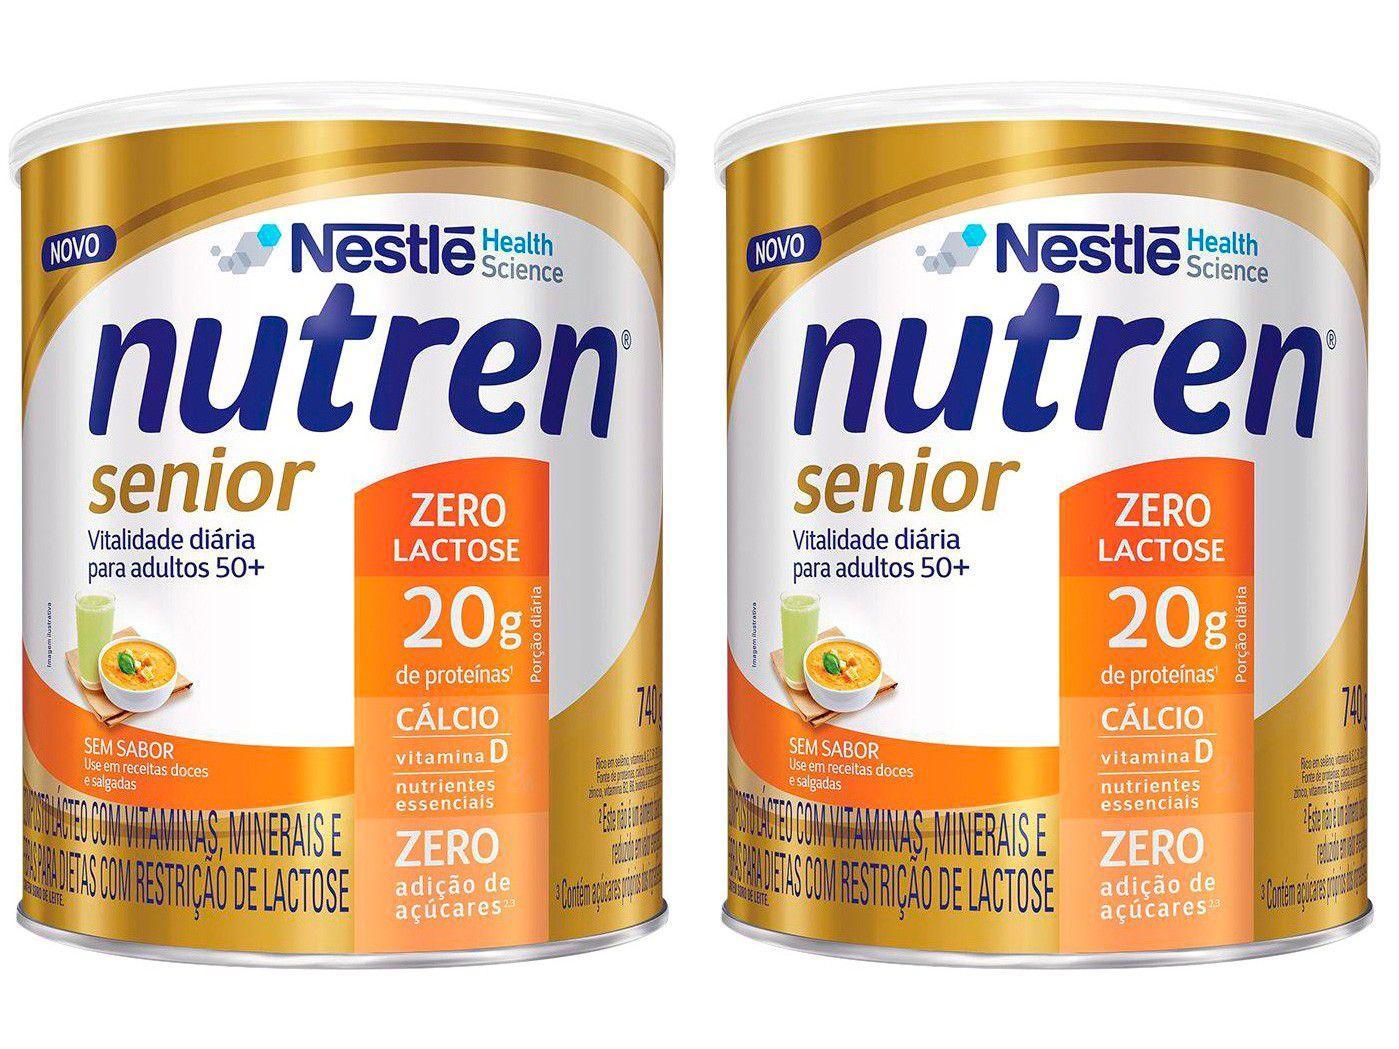 Kit Suplemento Alimentar Adulto Nutren Senior - Sem Sabor Zero Açúcar sem Lactose 740g 2 Unidades